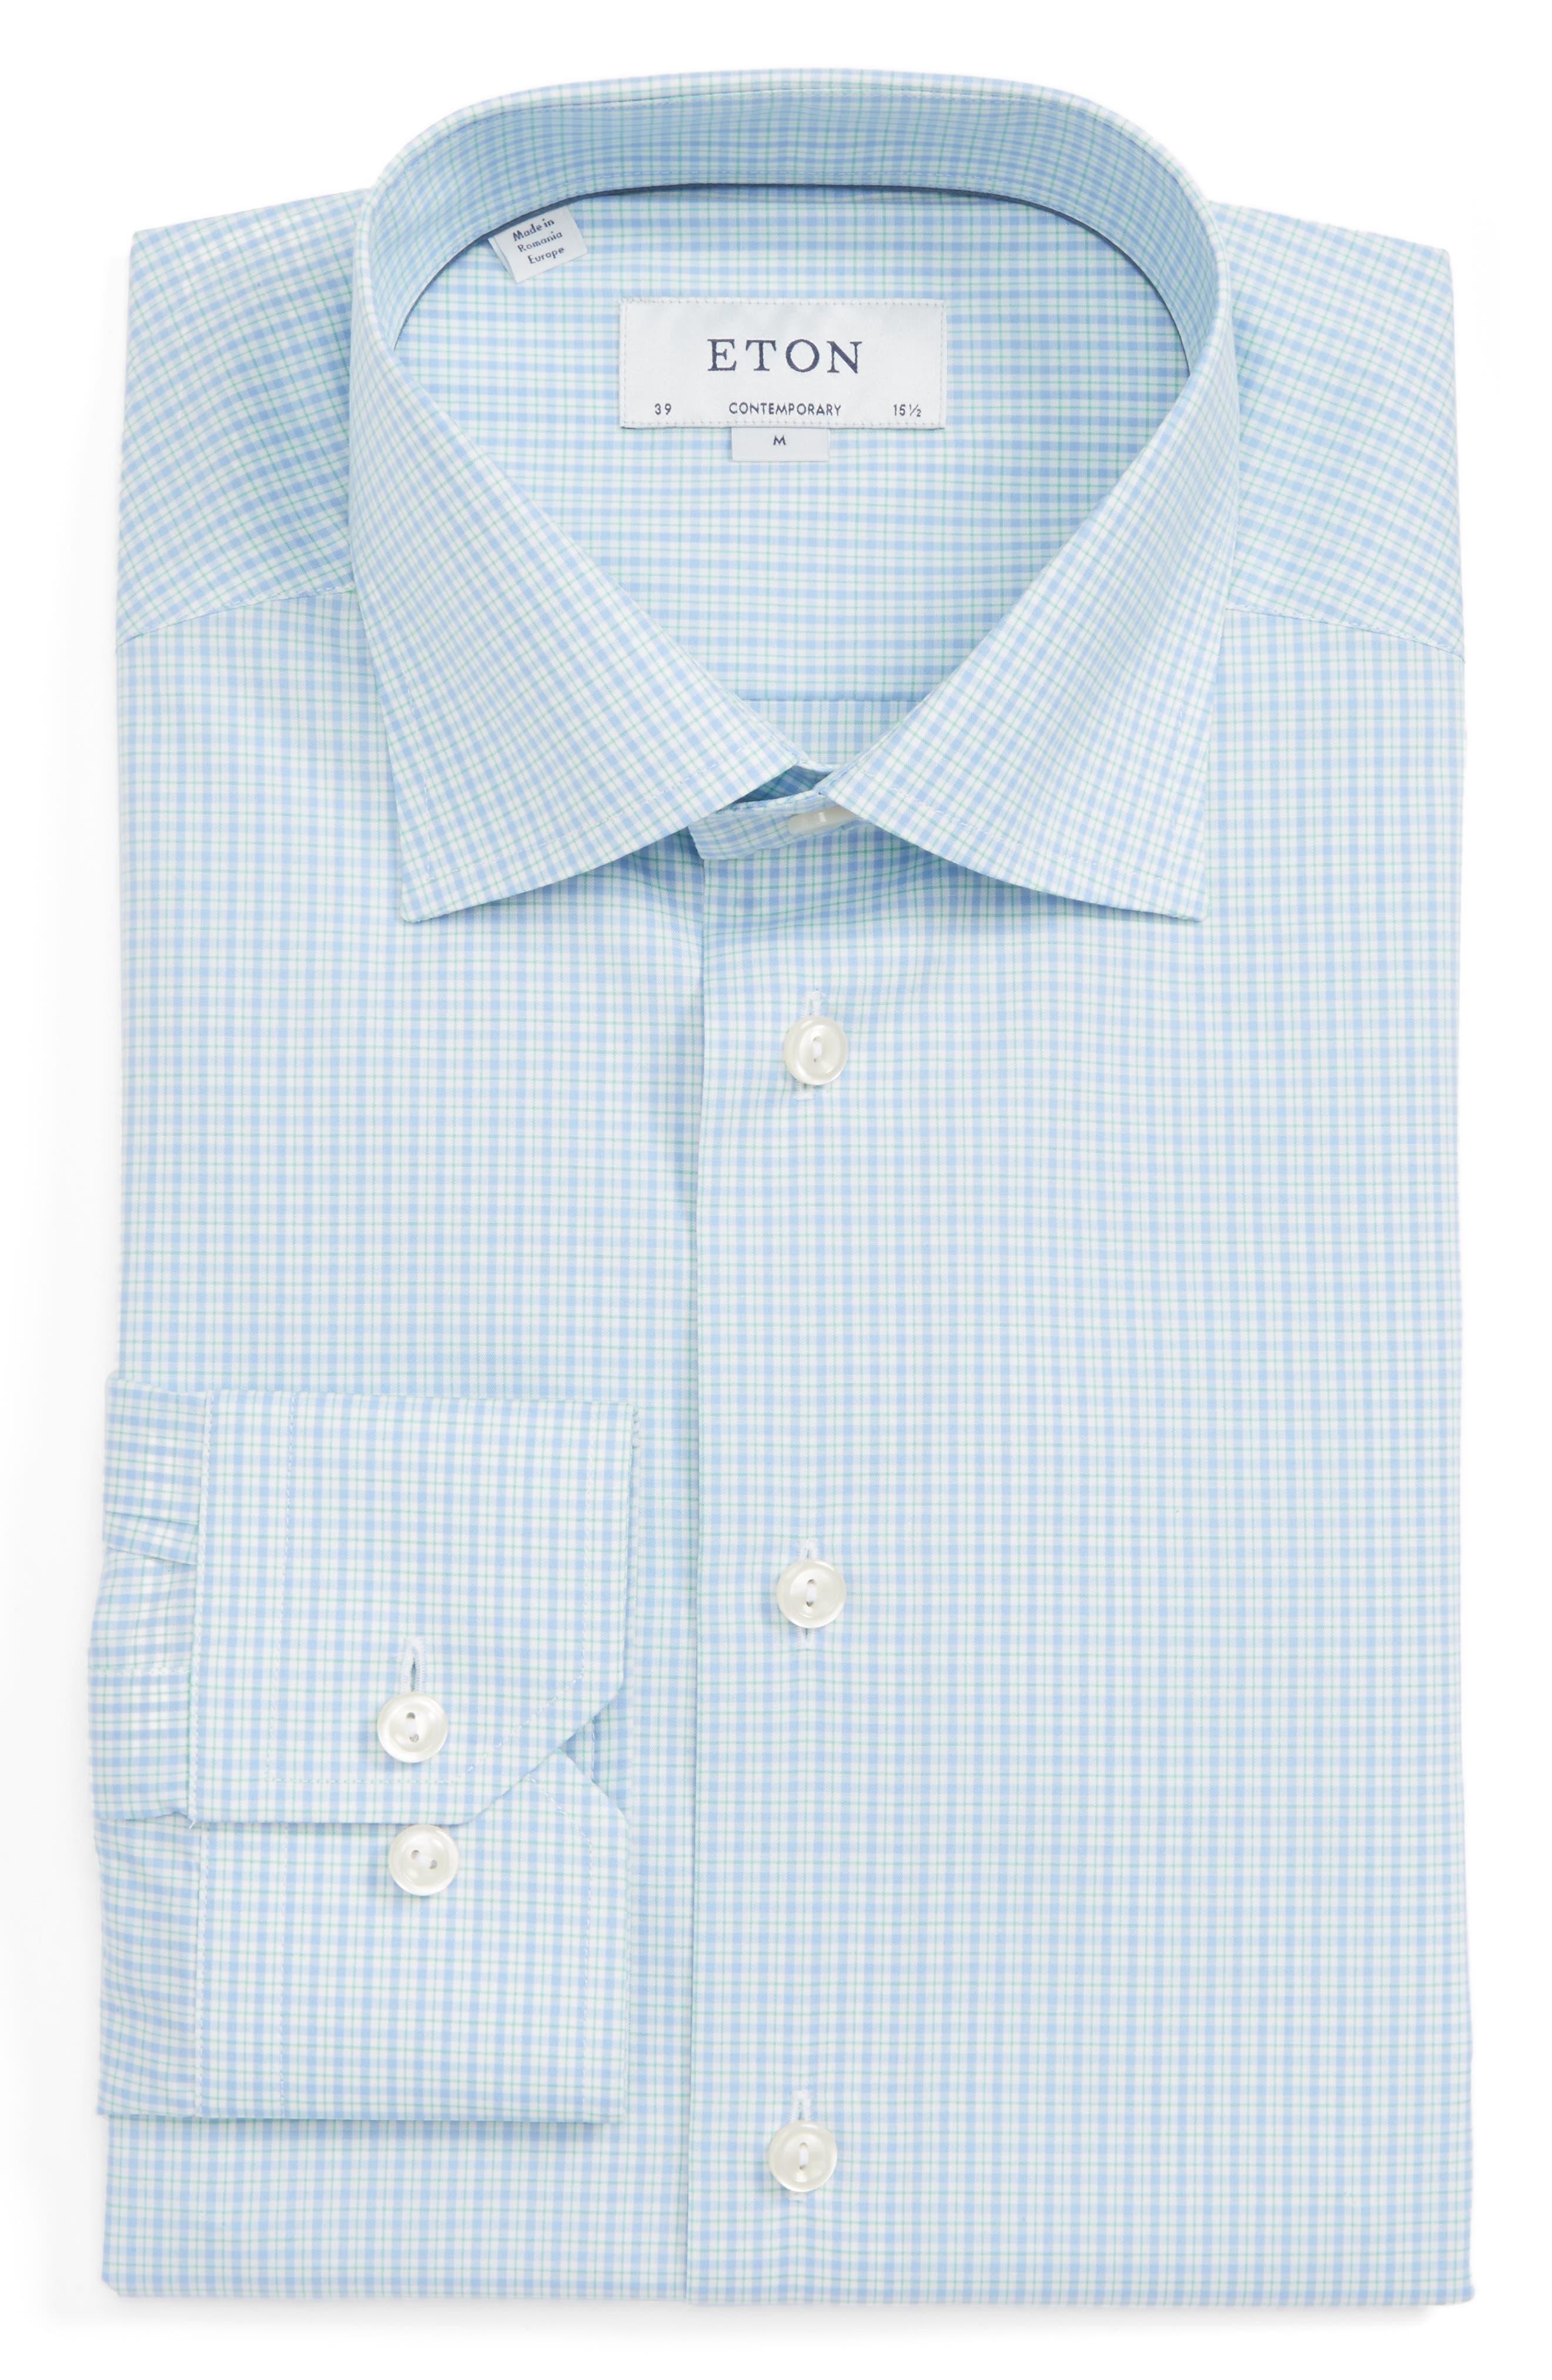 Contemporary Fit Check Dress Shirt,                         Main,                         color, Blue/ Green